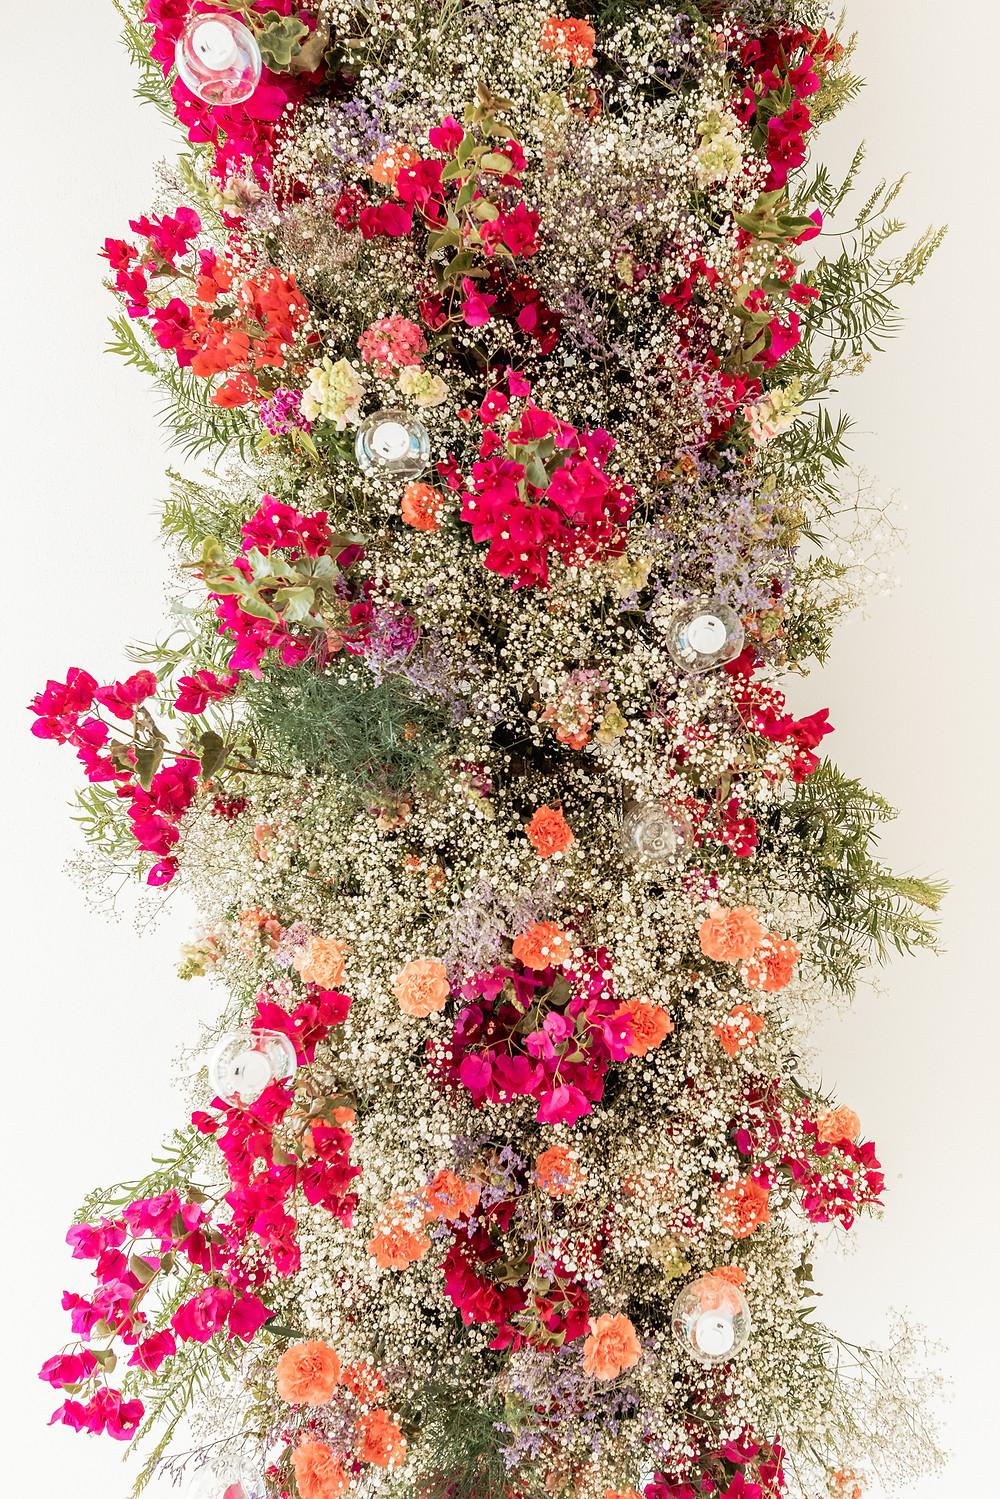 Hanging flowers!